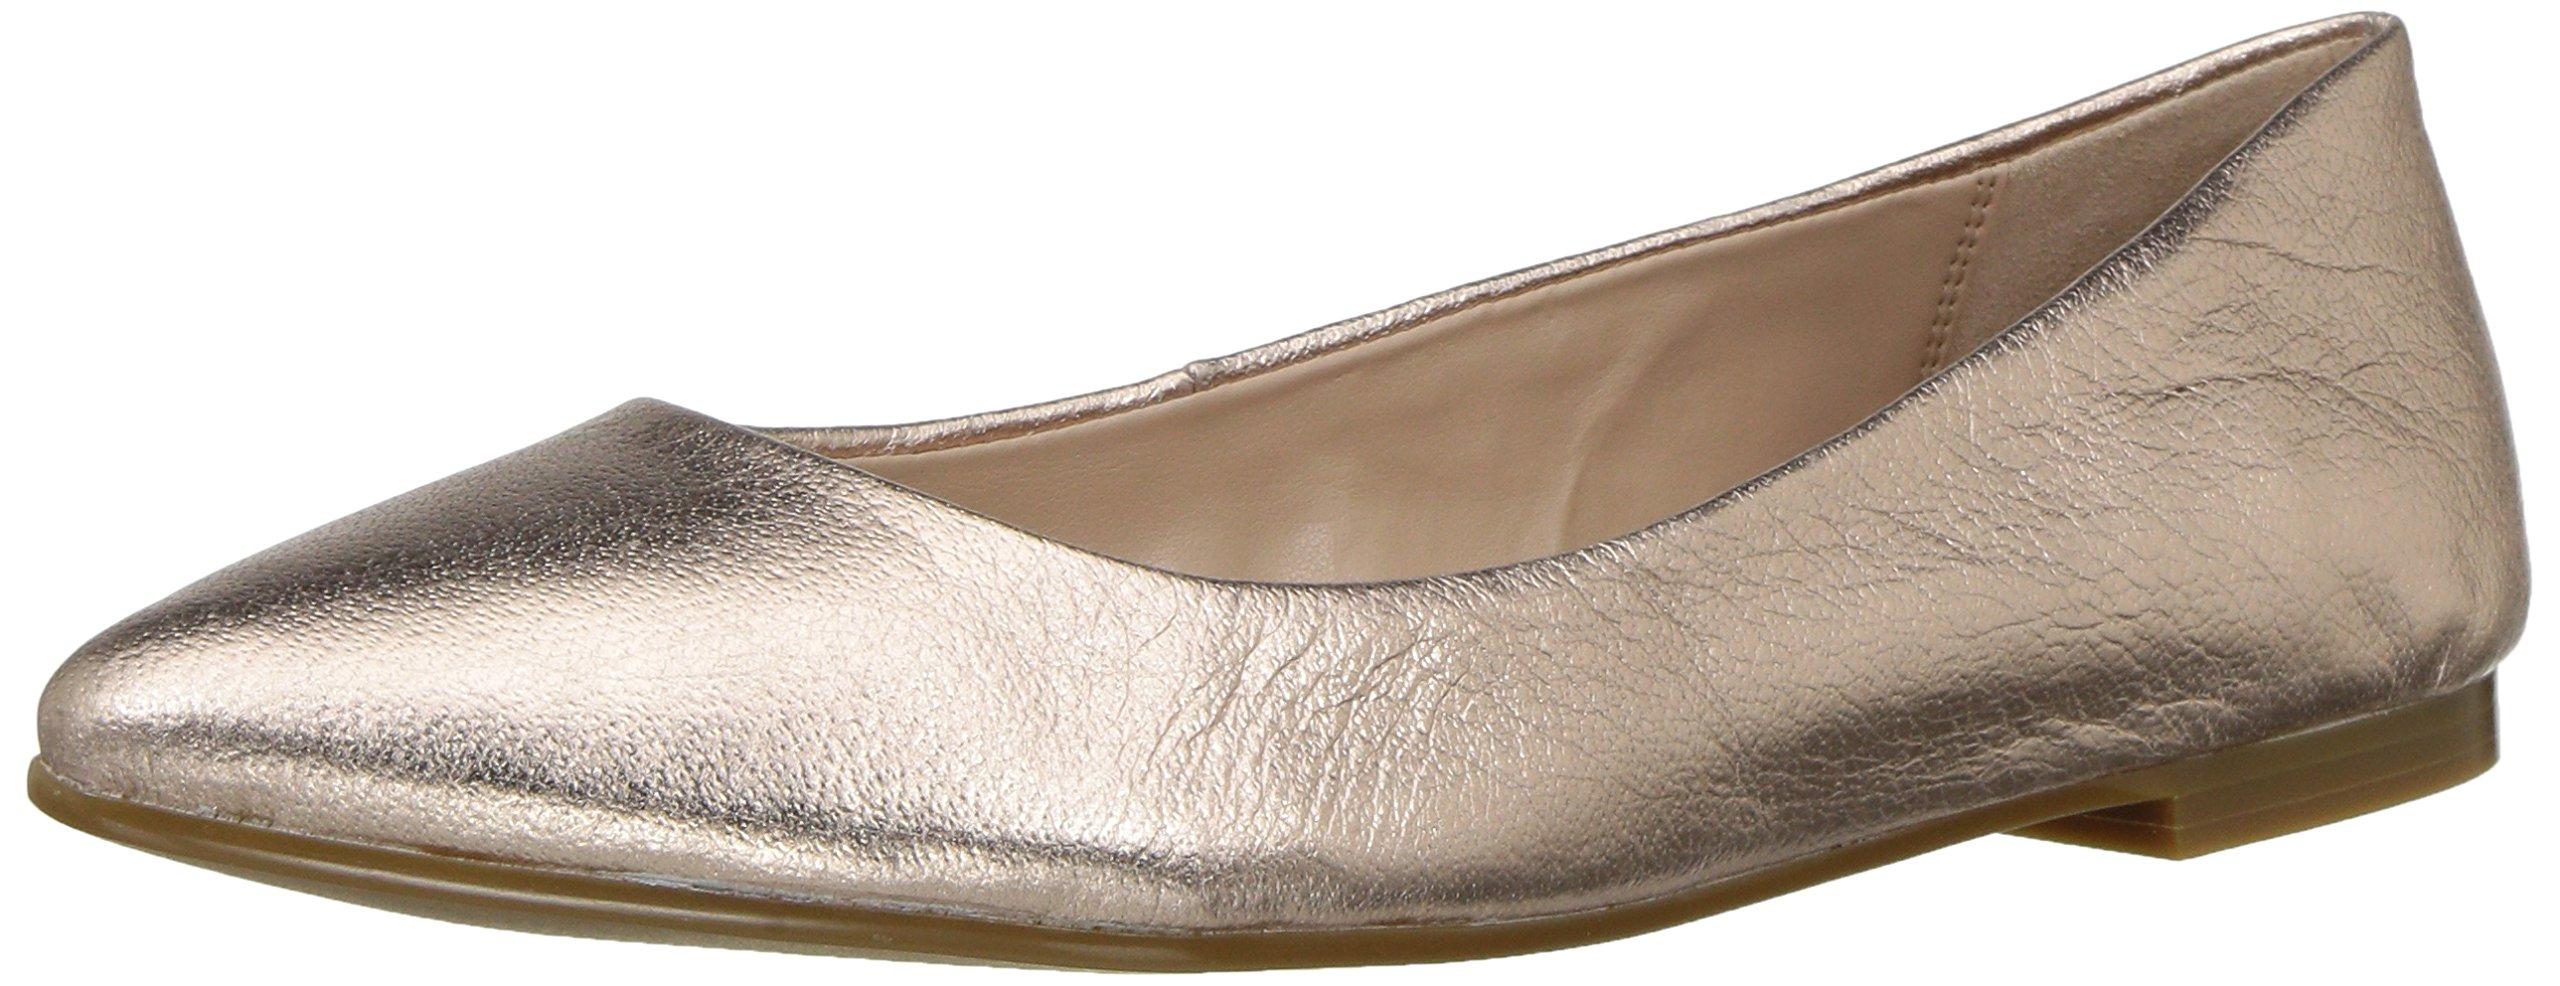 BCBG Generation Women's Millie Ballet Flat, Rosegold Leather, 6.5 M US